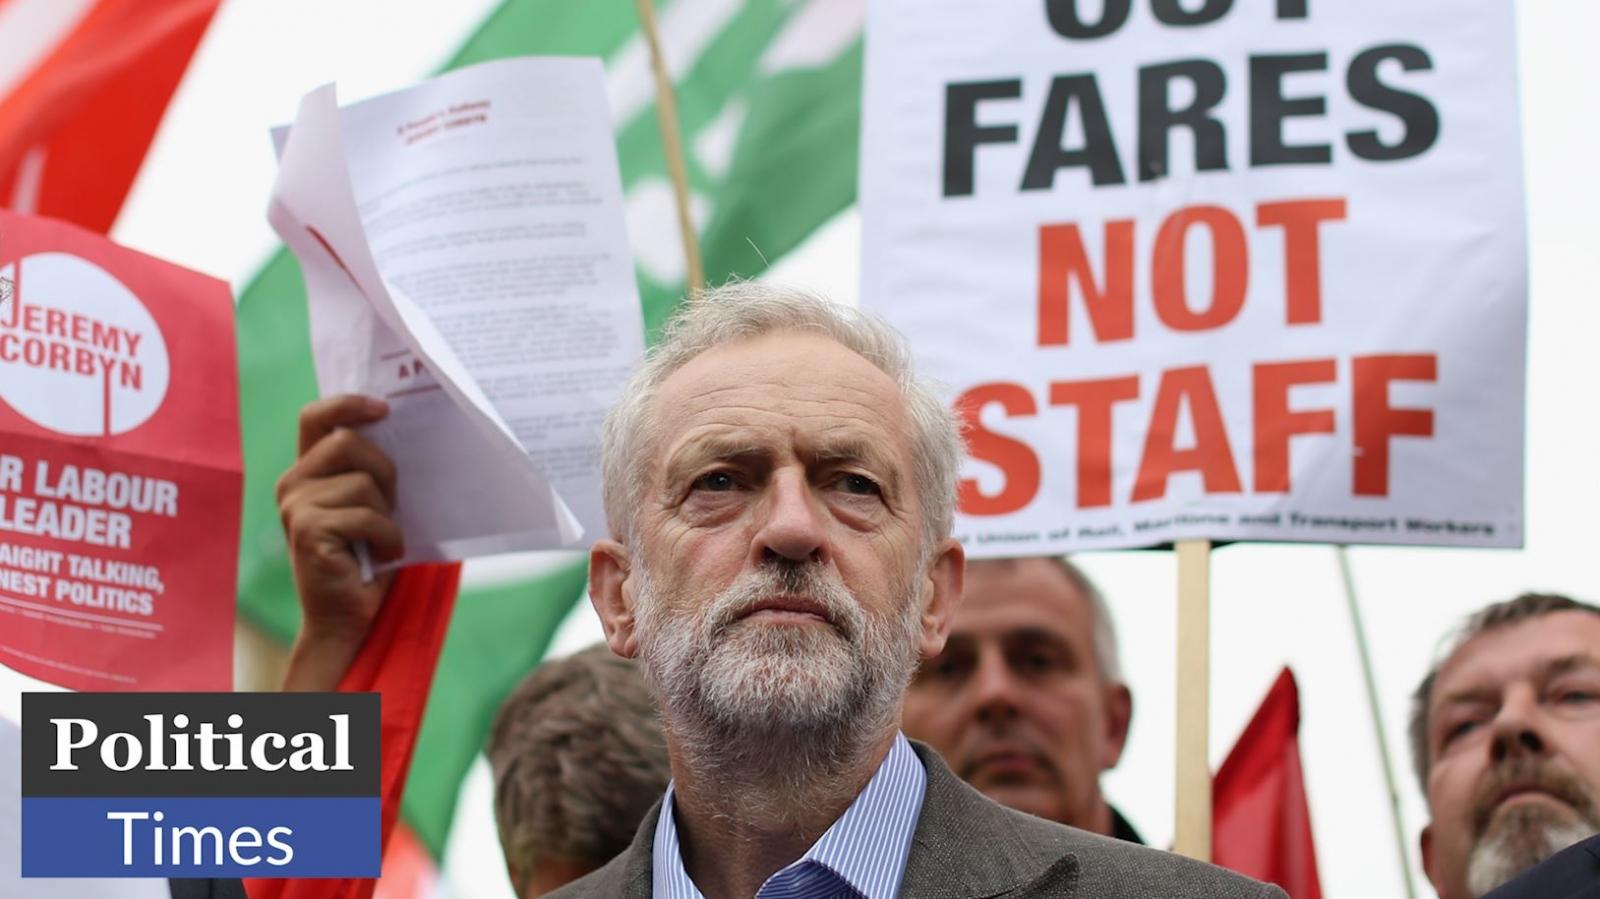 Jeremy Corbyn at Kings Cross Political Times